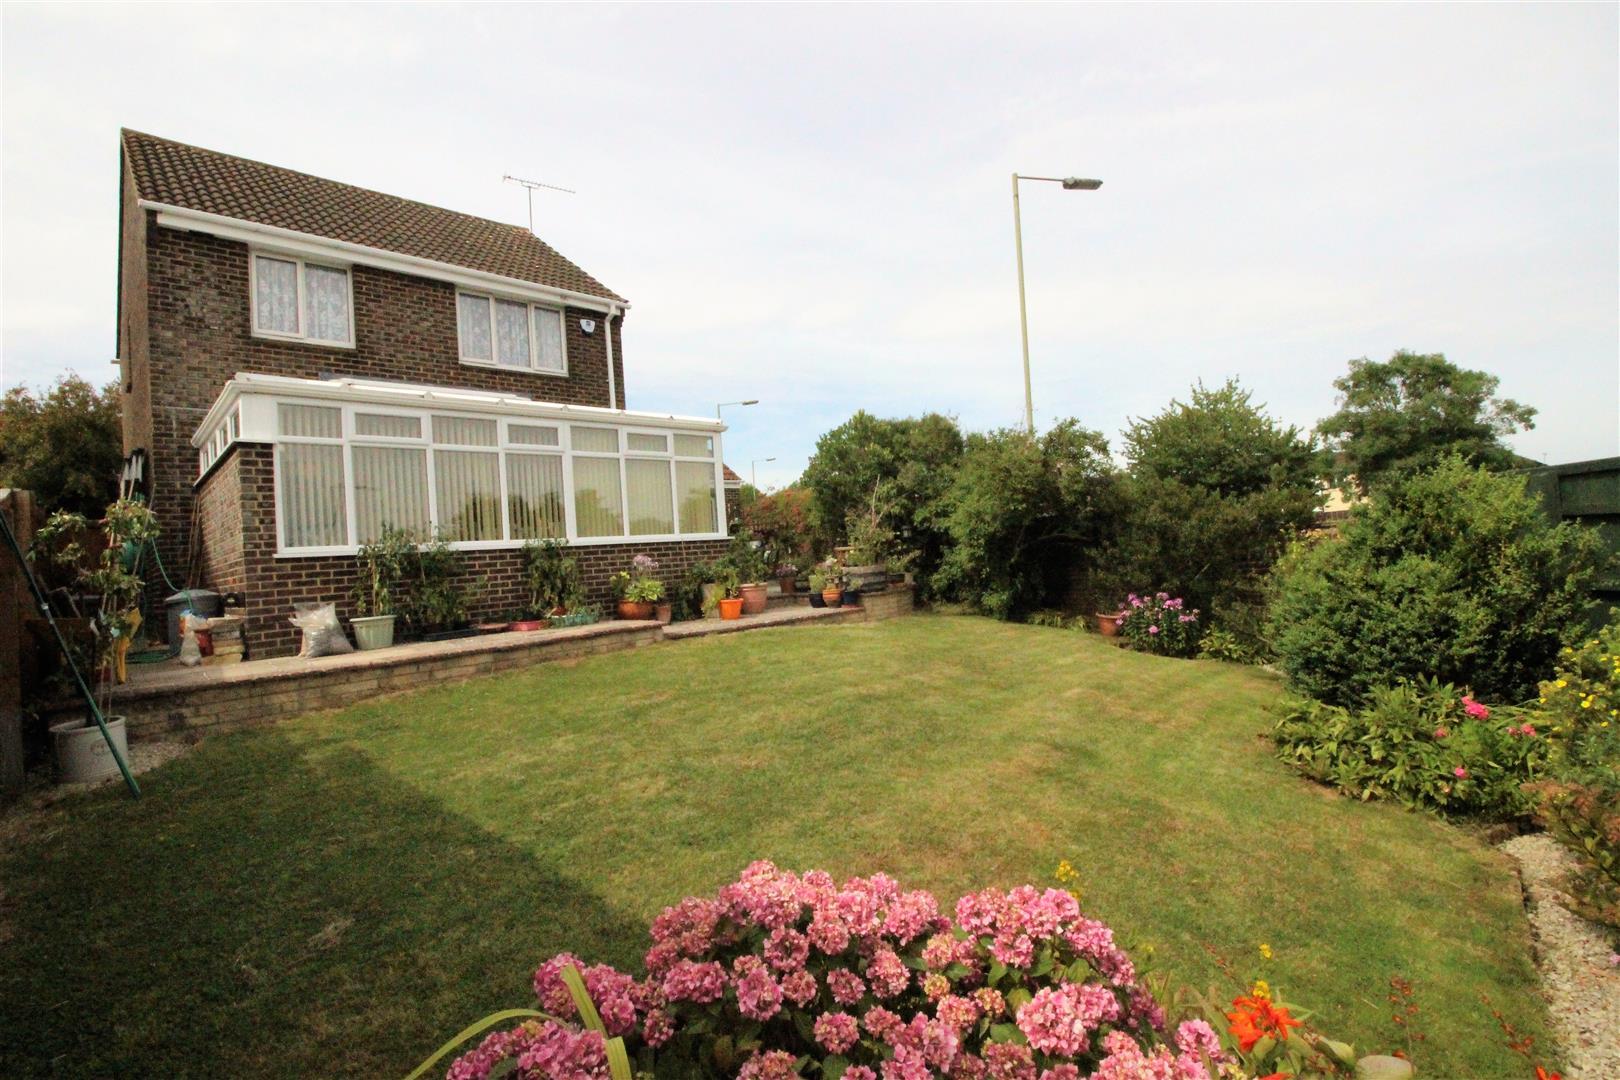 3 Bedrooms Property for sale in Castlefield Close, Eastleaze, Swindon